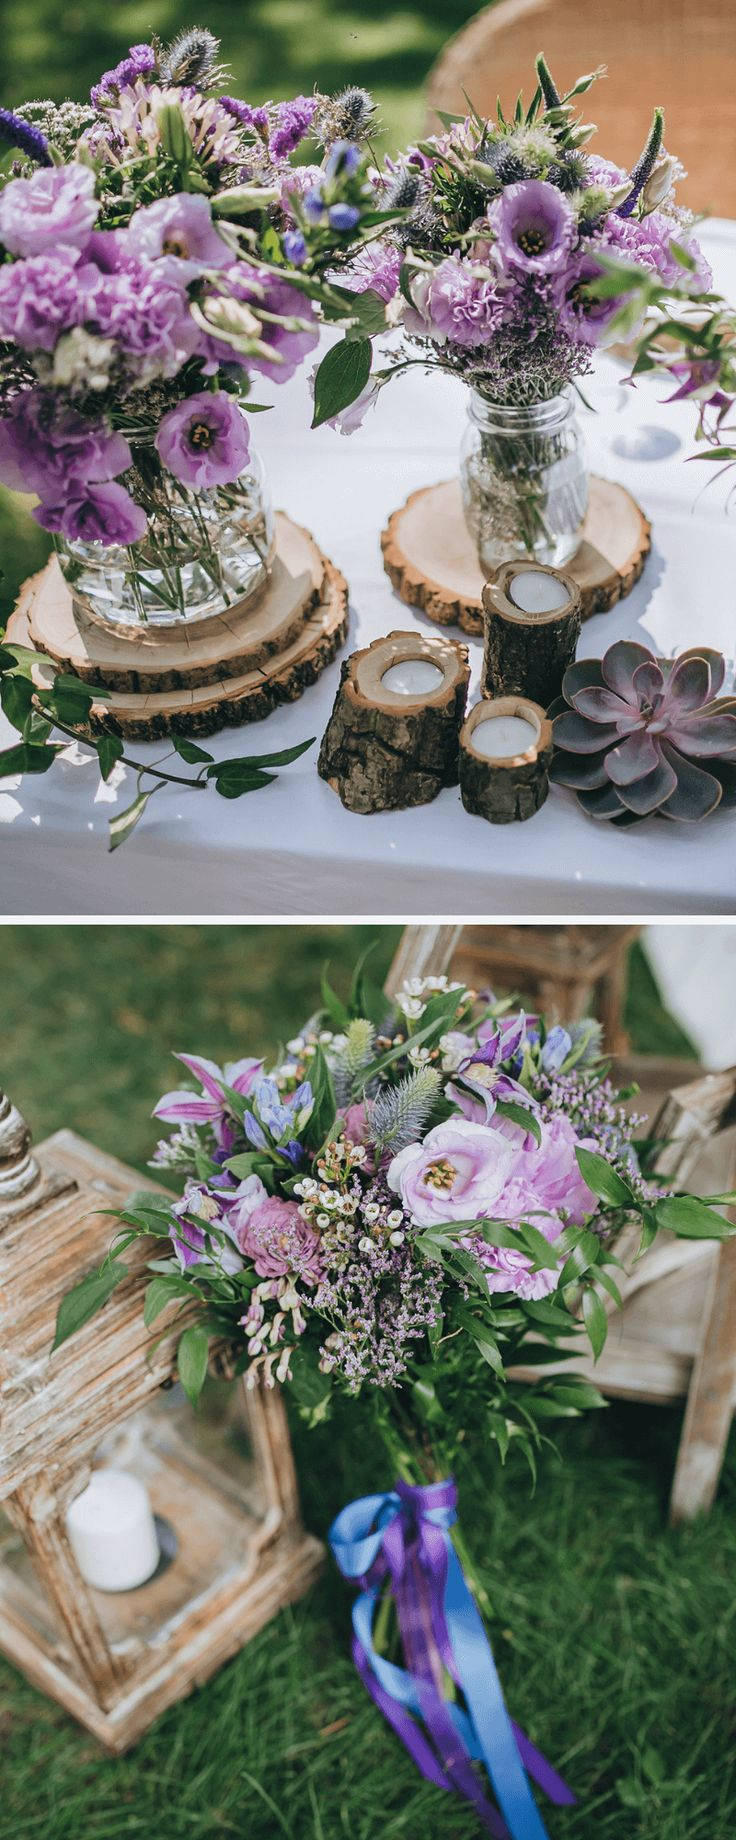 Wildflower deco ideas for rustic weddings